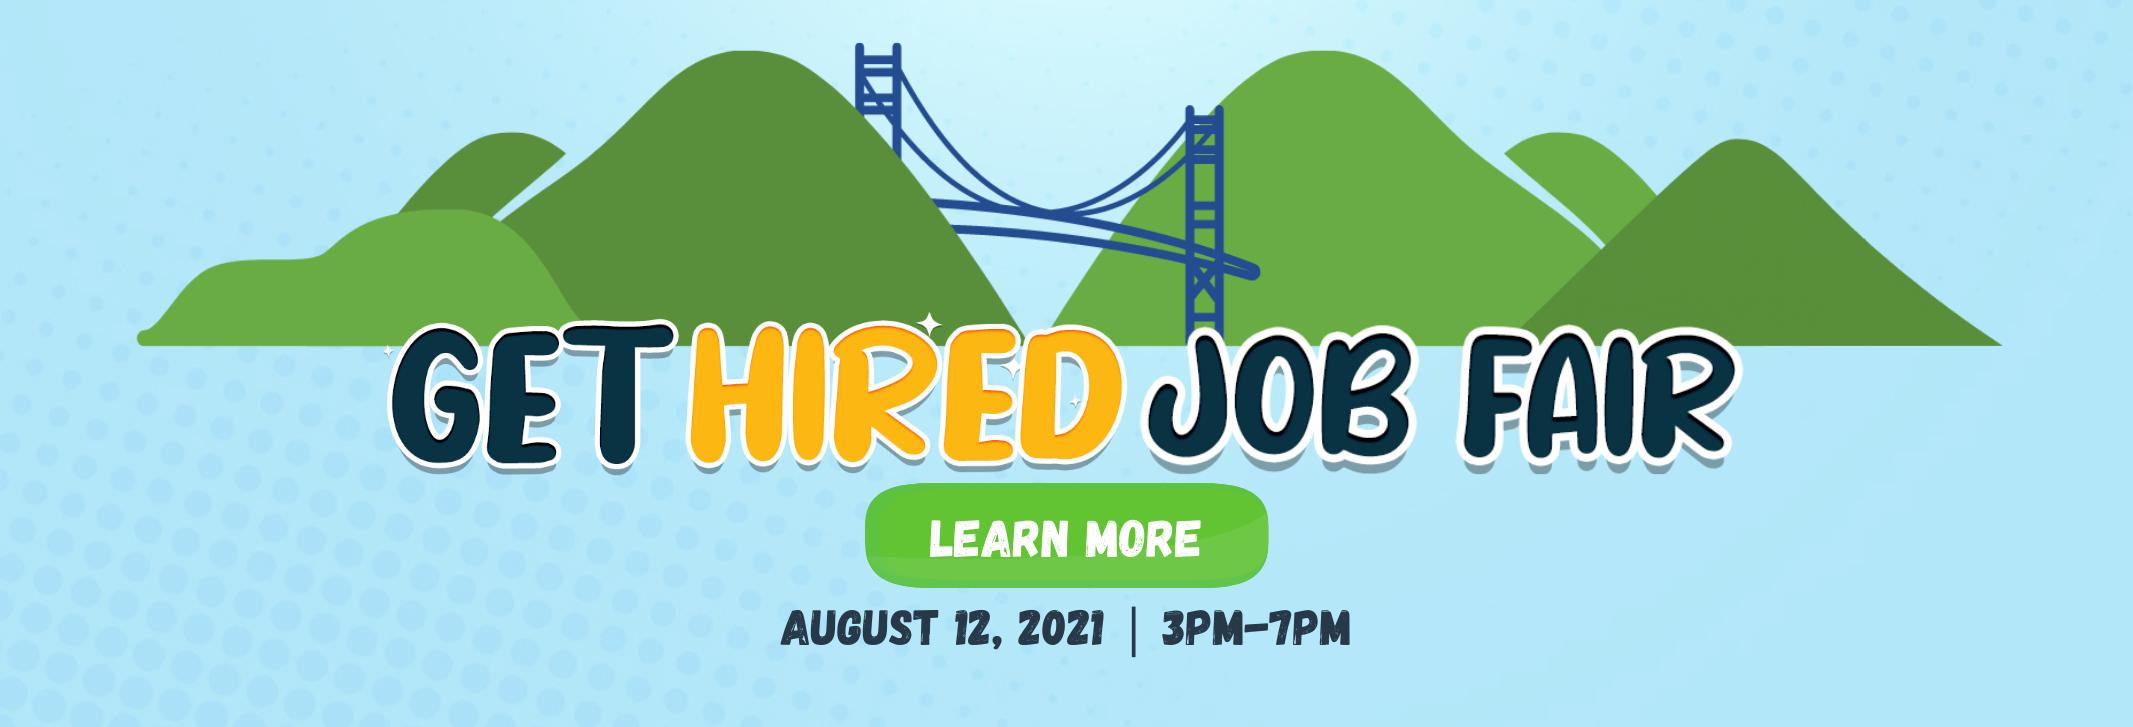 Job Fair Website Slider